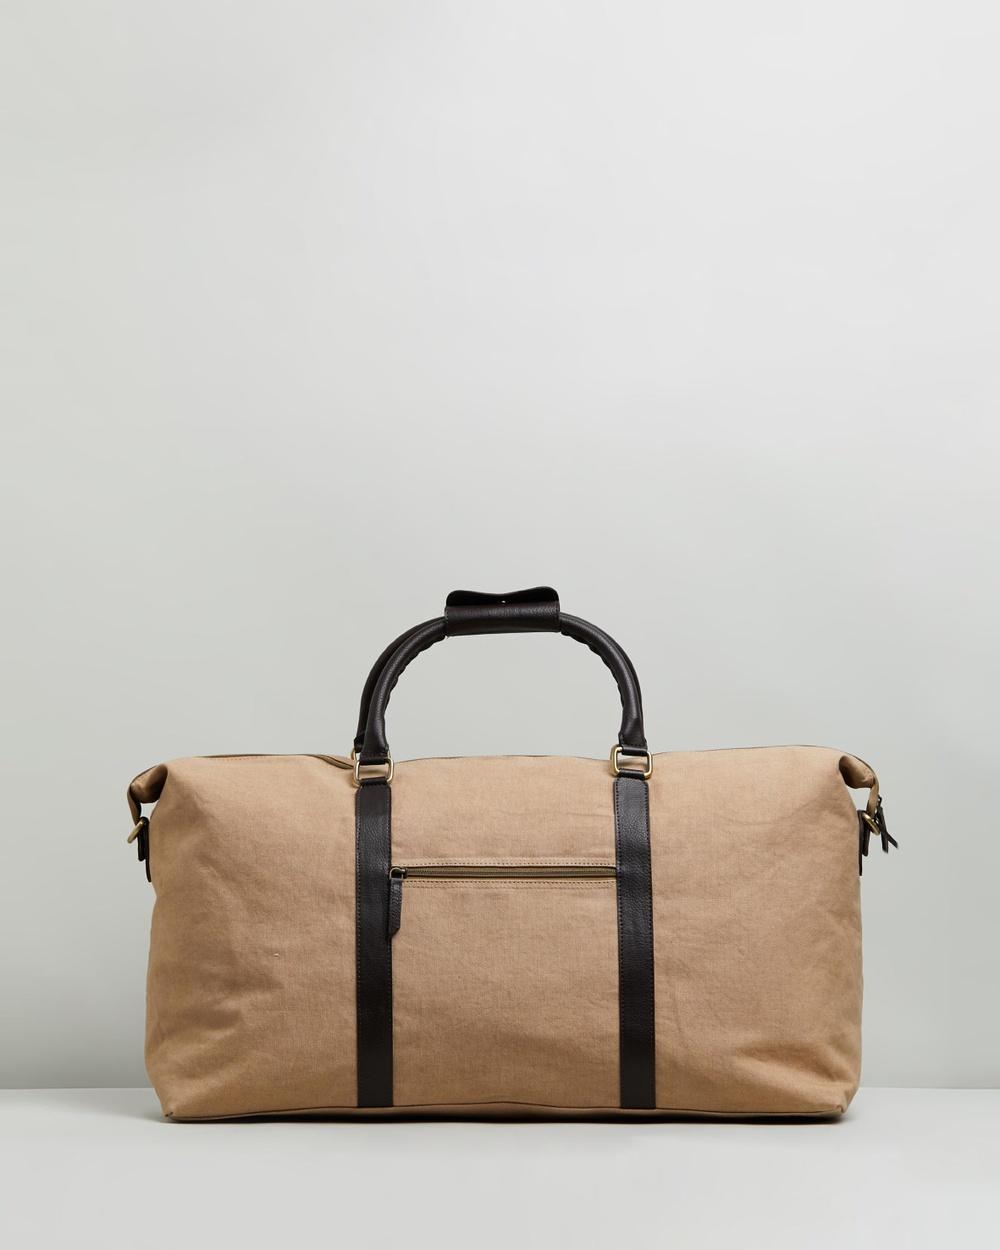 Staple Superior Downtown Weekender Duffle Bags Sand & Brown